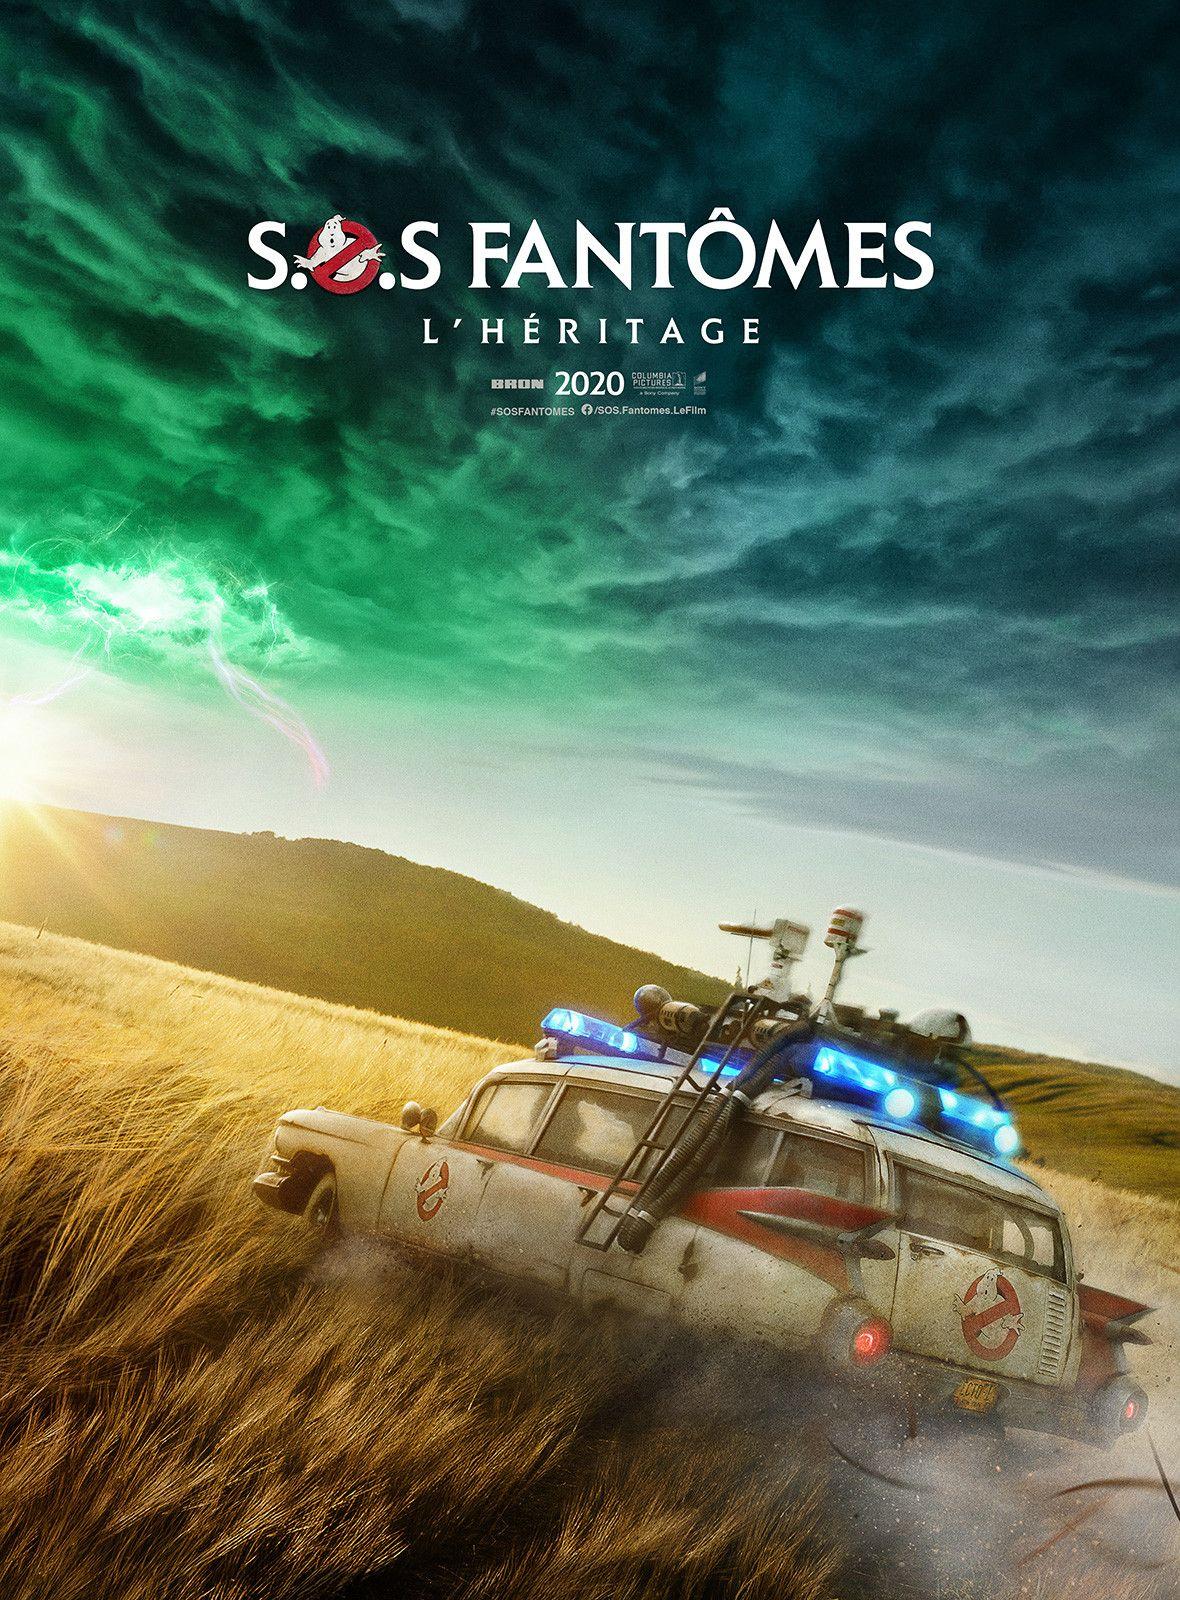 Film S O S Fantomes L Heritage Recherche Google Films Complets Films Netflix Idee Film